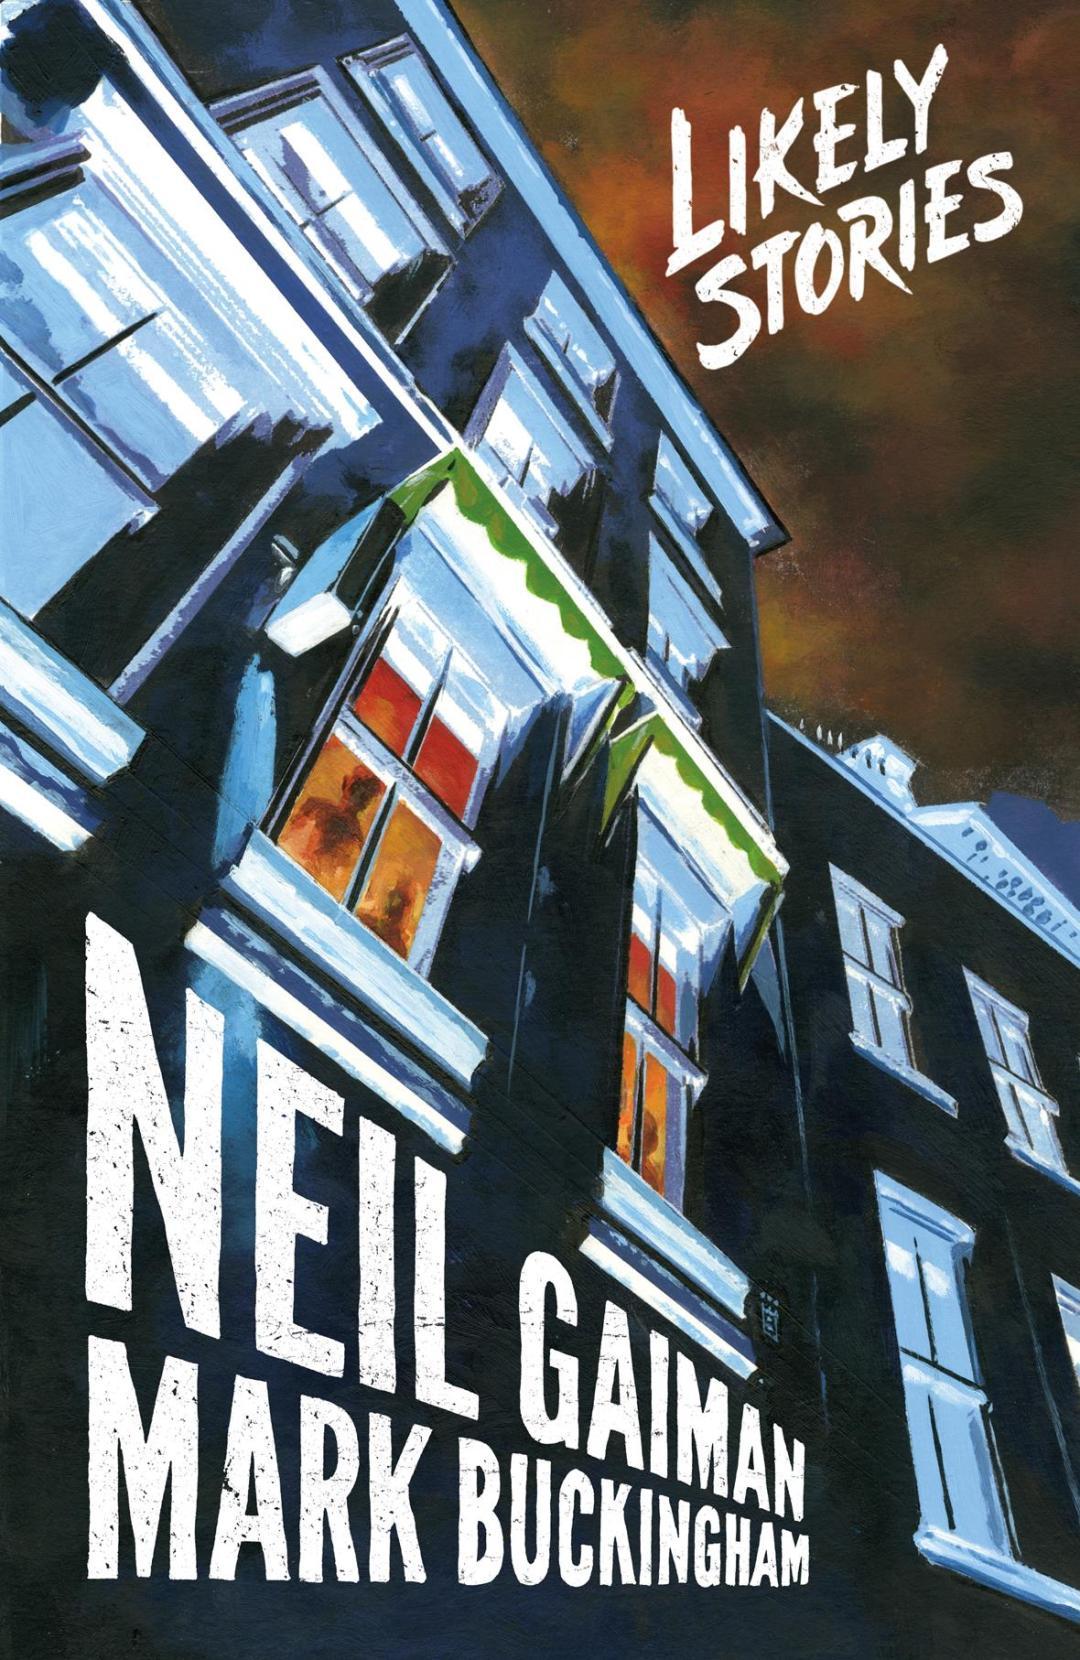 Eisner Award-Winning Creator Mark Buckingham Adapts New York Times Bestselling Author Neil Gaiman's 'Likely Stories' for Dark Horse Books